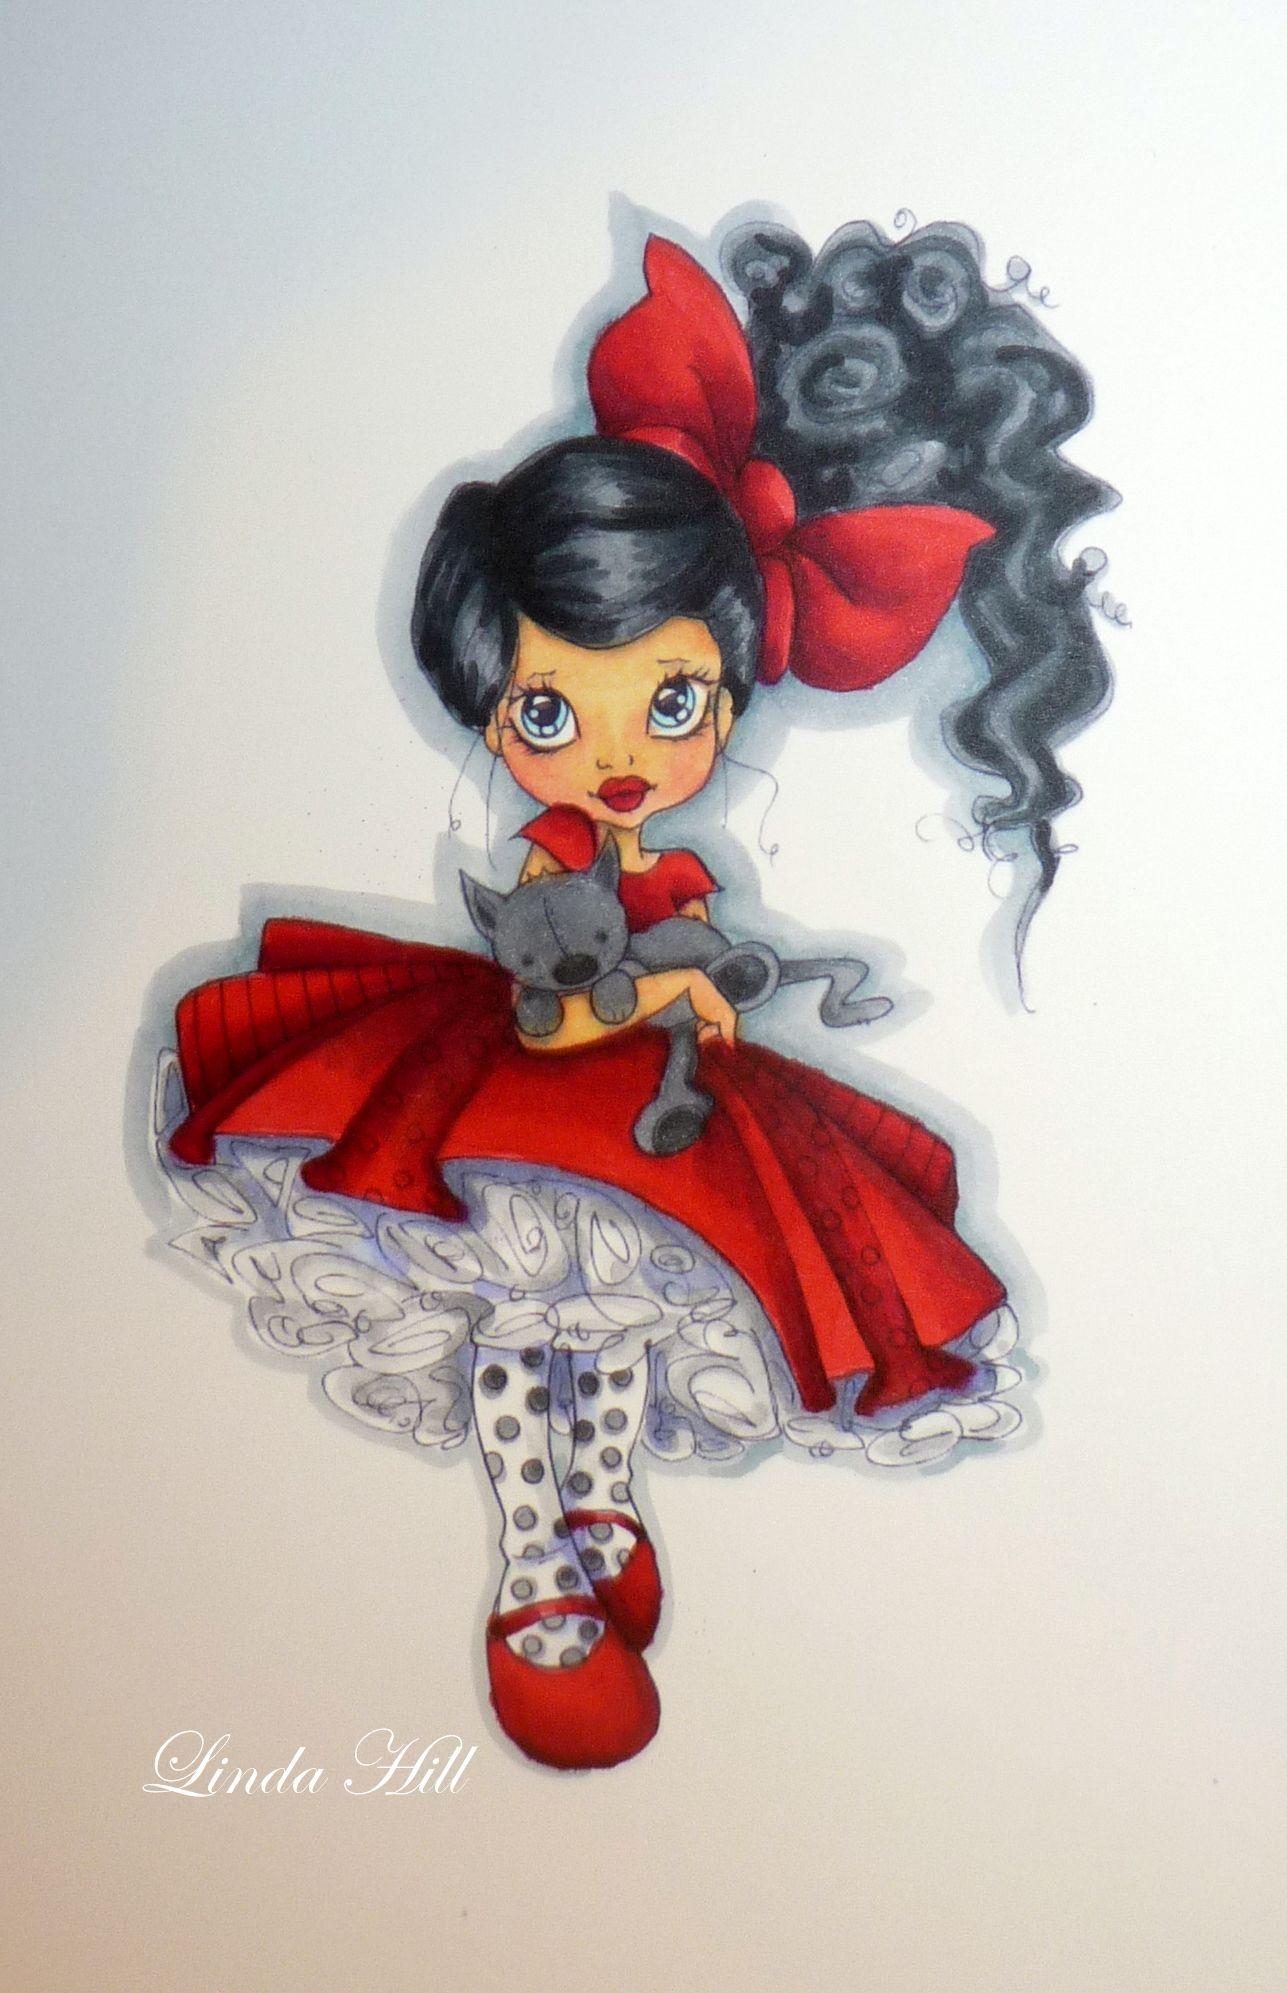 〆(⸅᷇˾ͨ⸅᷆ ˡ᷅ͮ˒)                                                                  ✄little red dress in spectrum noir pens